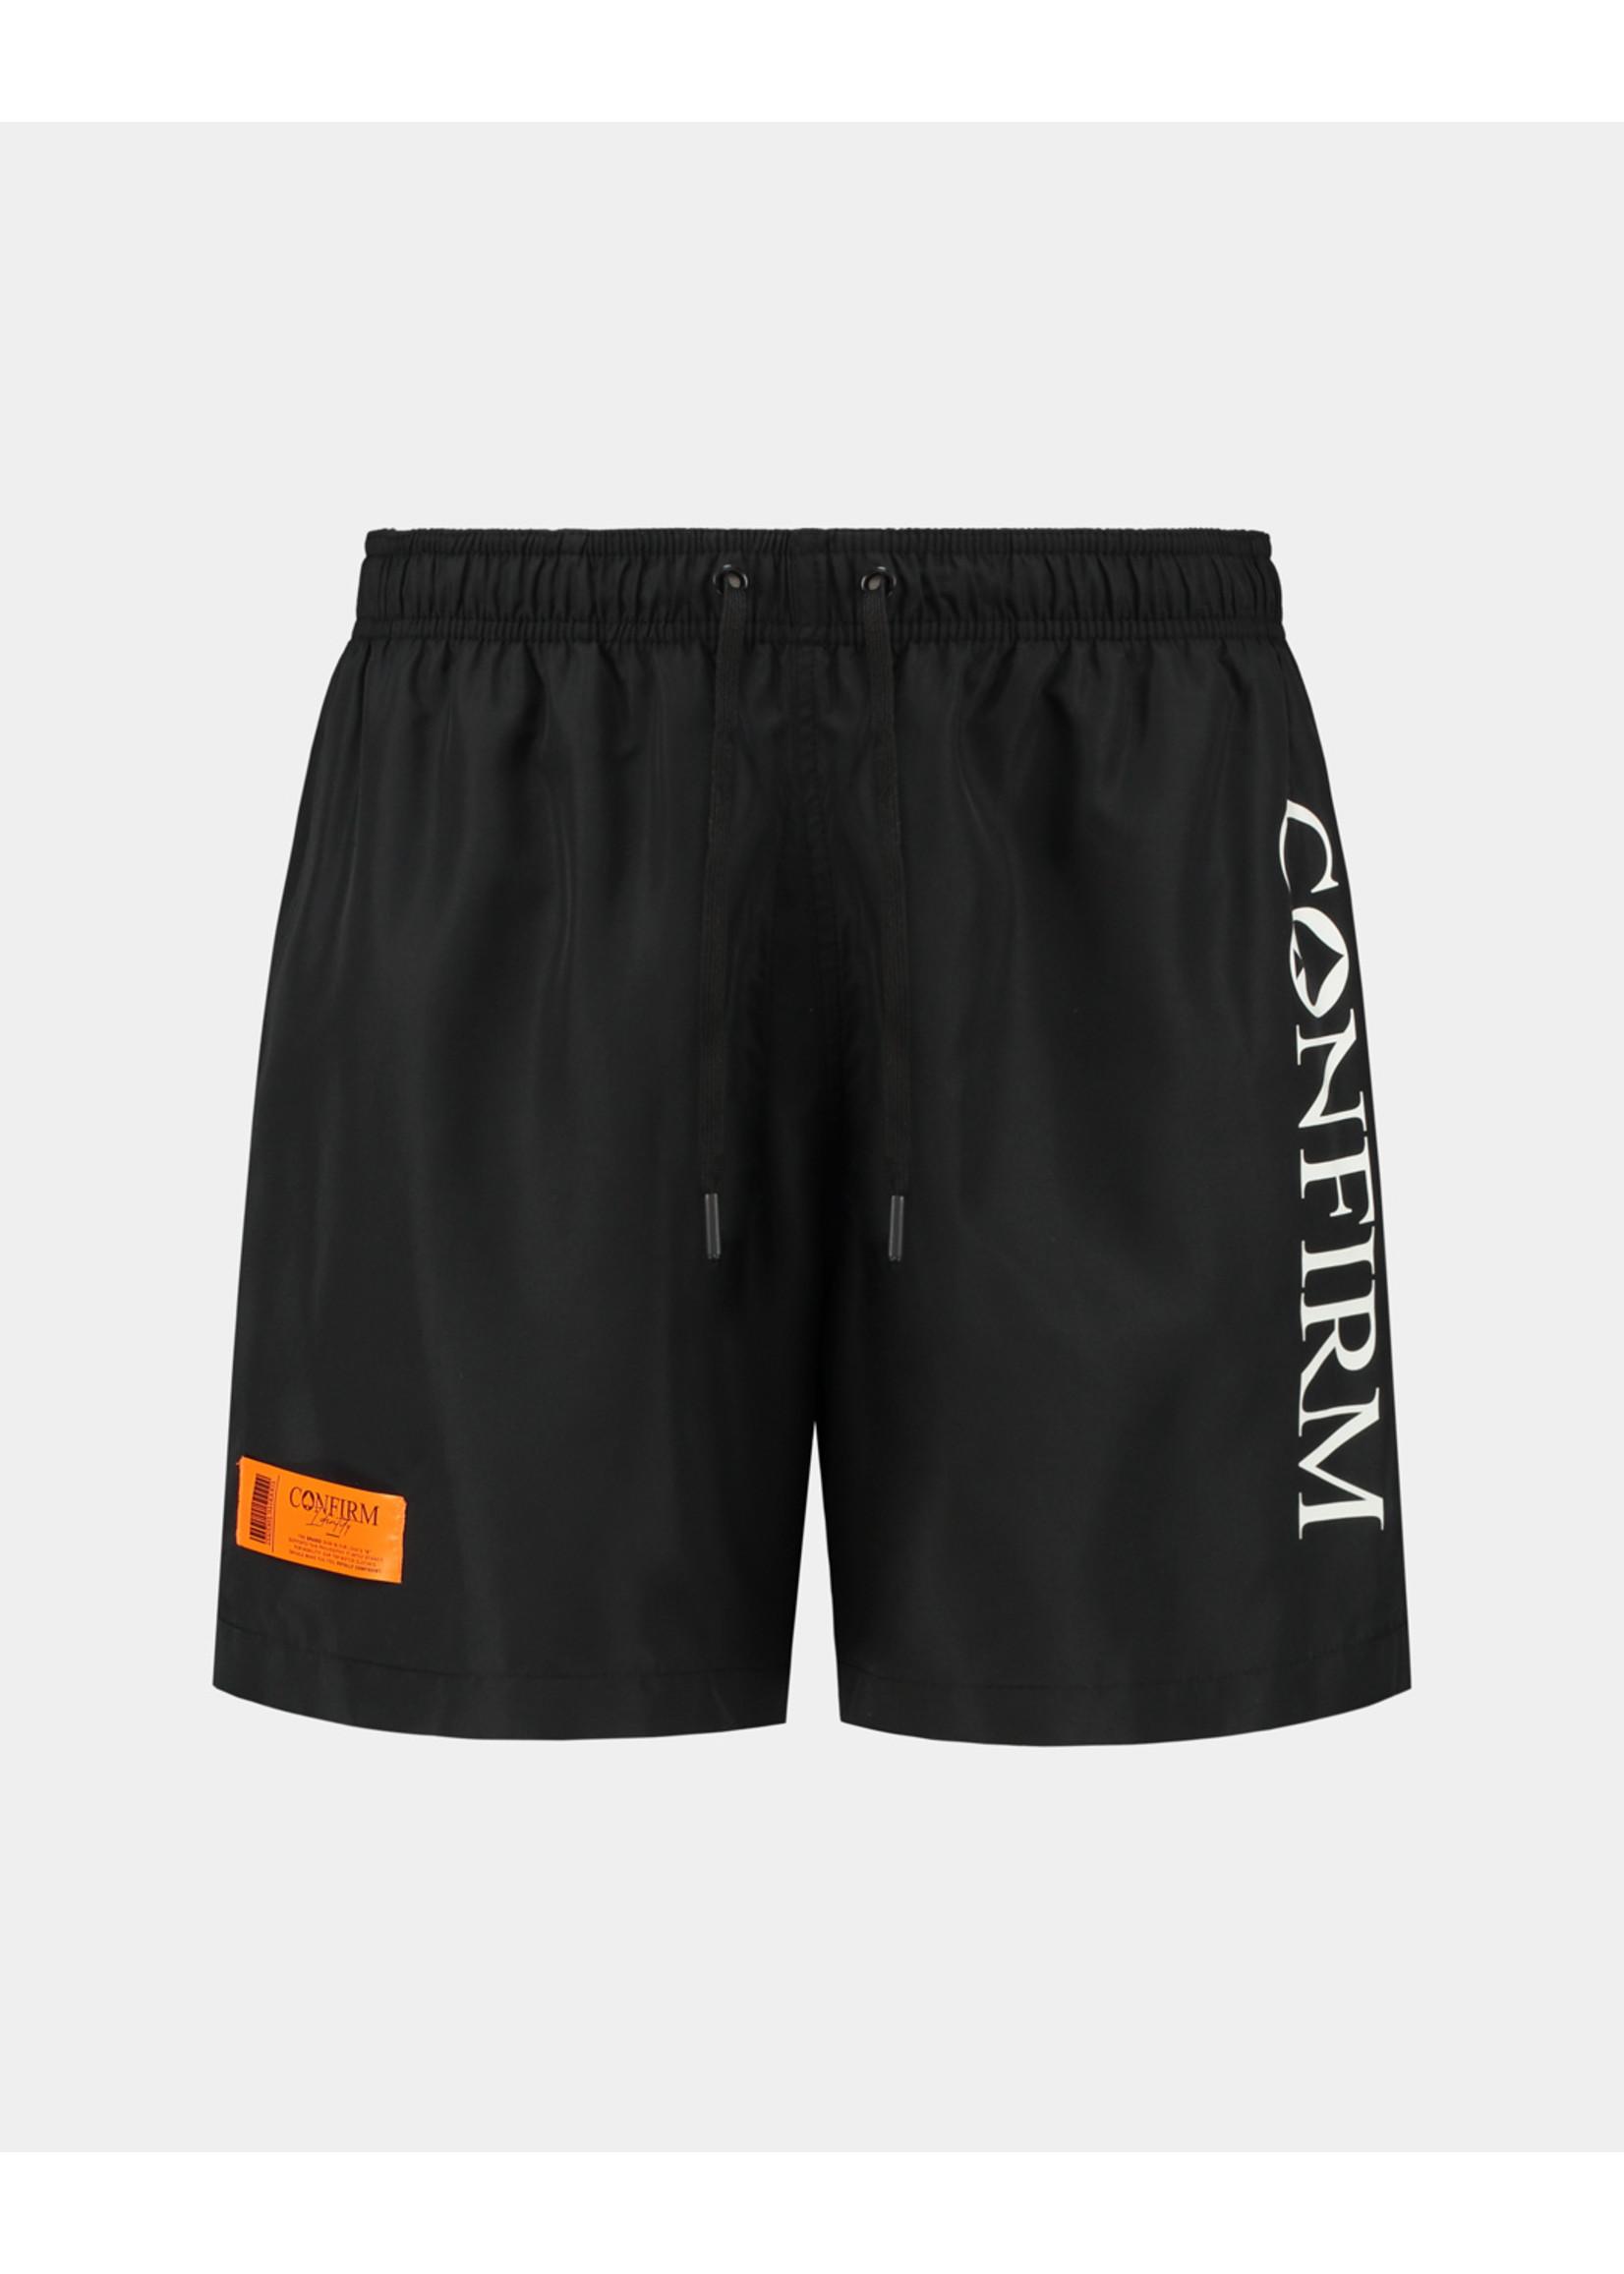 Confirm brand swim short O.G. - black/orange